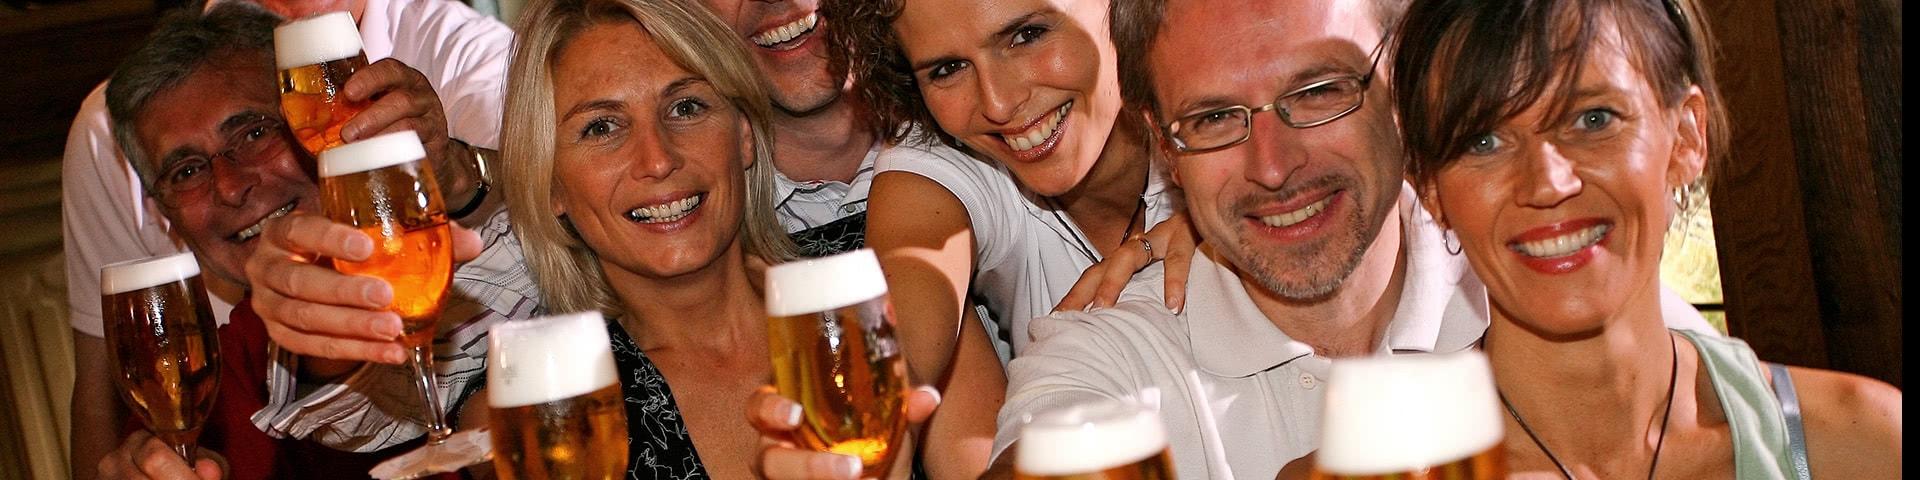 Gruppe trinkt gemeinsam Bier im U-Fleku in Prag